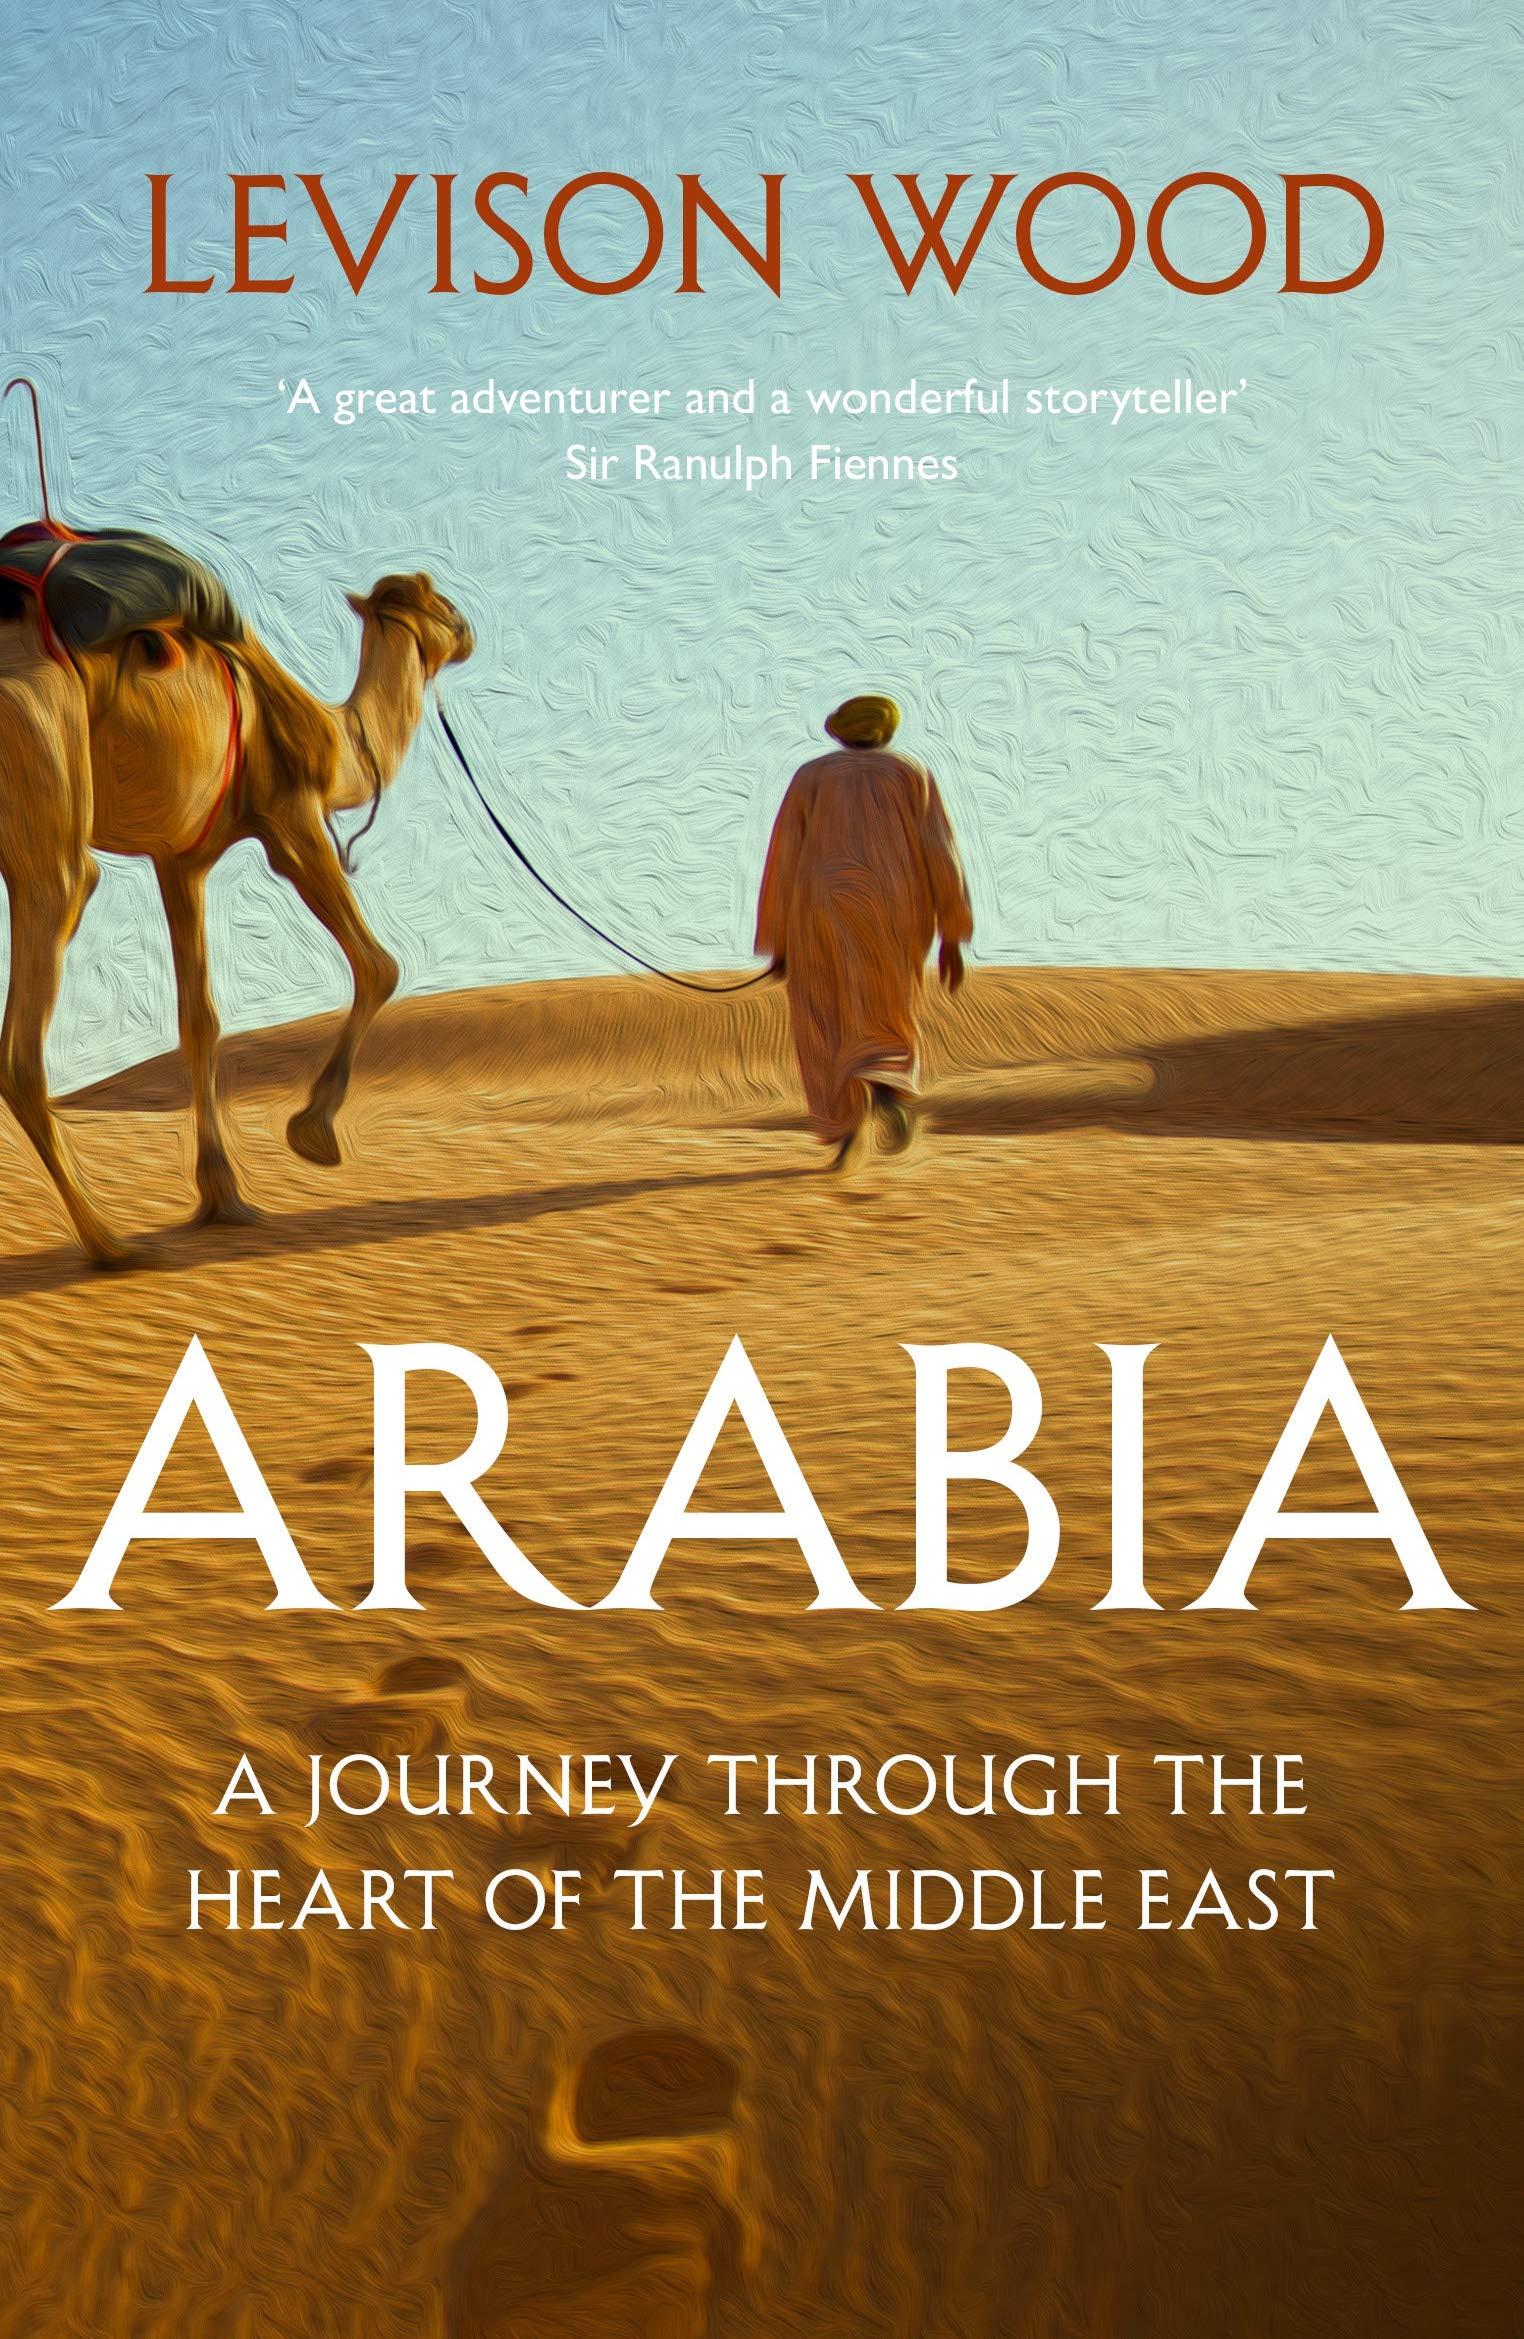 Reisverhaal Arabia | Levison Wood <br/>€ 14.95 <br/> <a href='https://www.dezwerver.nl/reisgidsen/?tt=1554_252853_241358_&r=https%3A%2F%2Fwww.dezwerver.nl%2Fr%2Fmidden-oosten%2Fdubai%2Fc%2Fboeken%2Freisverhalen%2F9781473676305%2Freisverhaal-arabia-levison-wood%2F' target='_blank'>Meer Info</a>